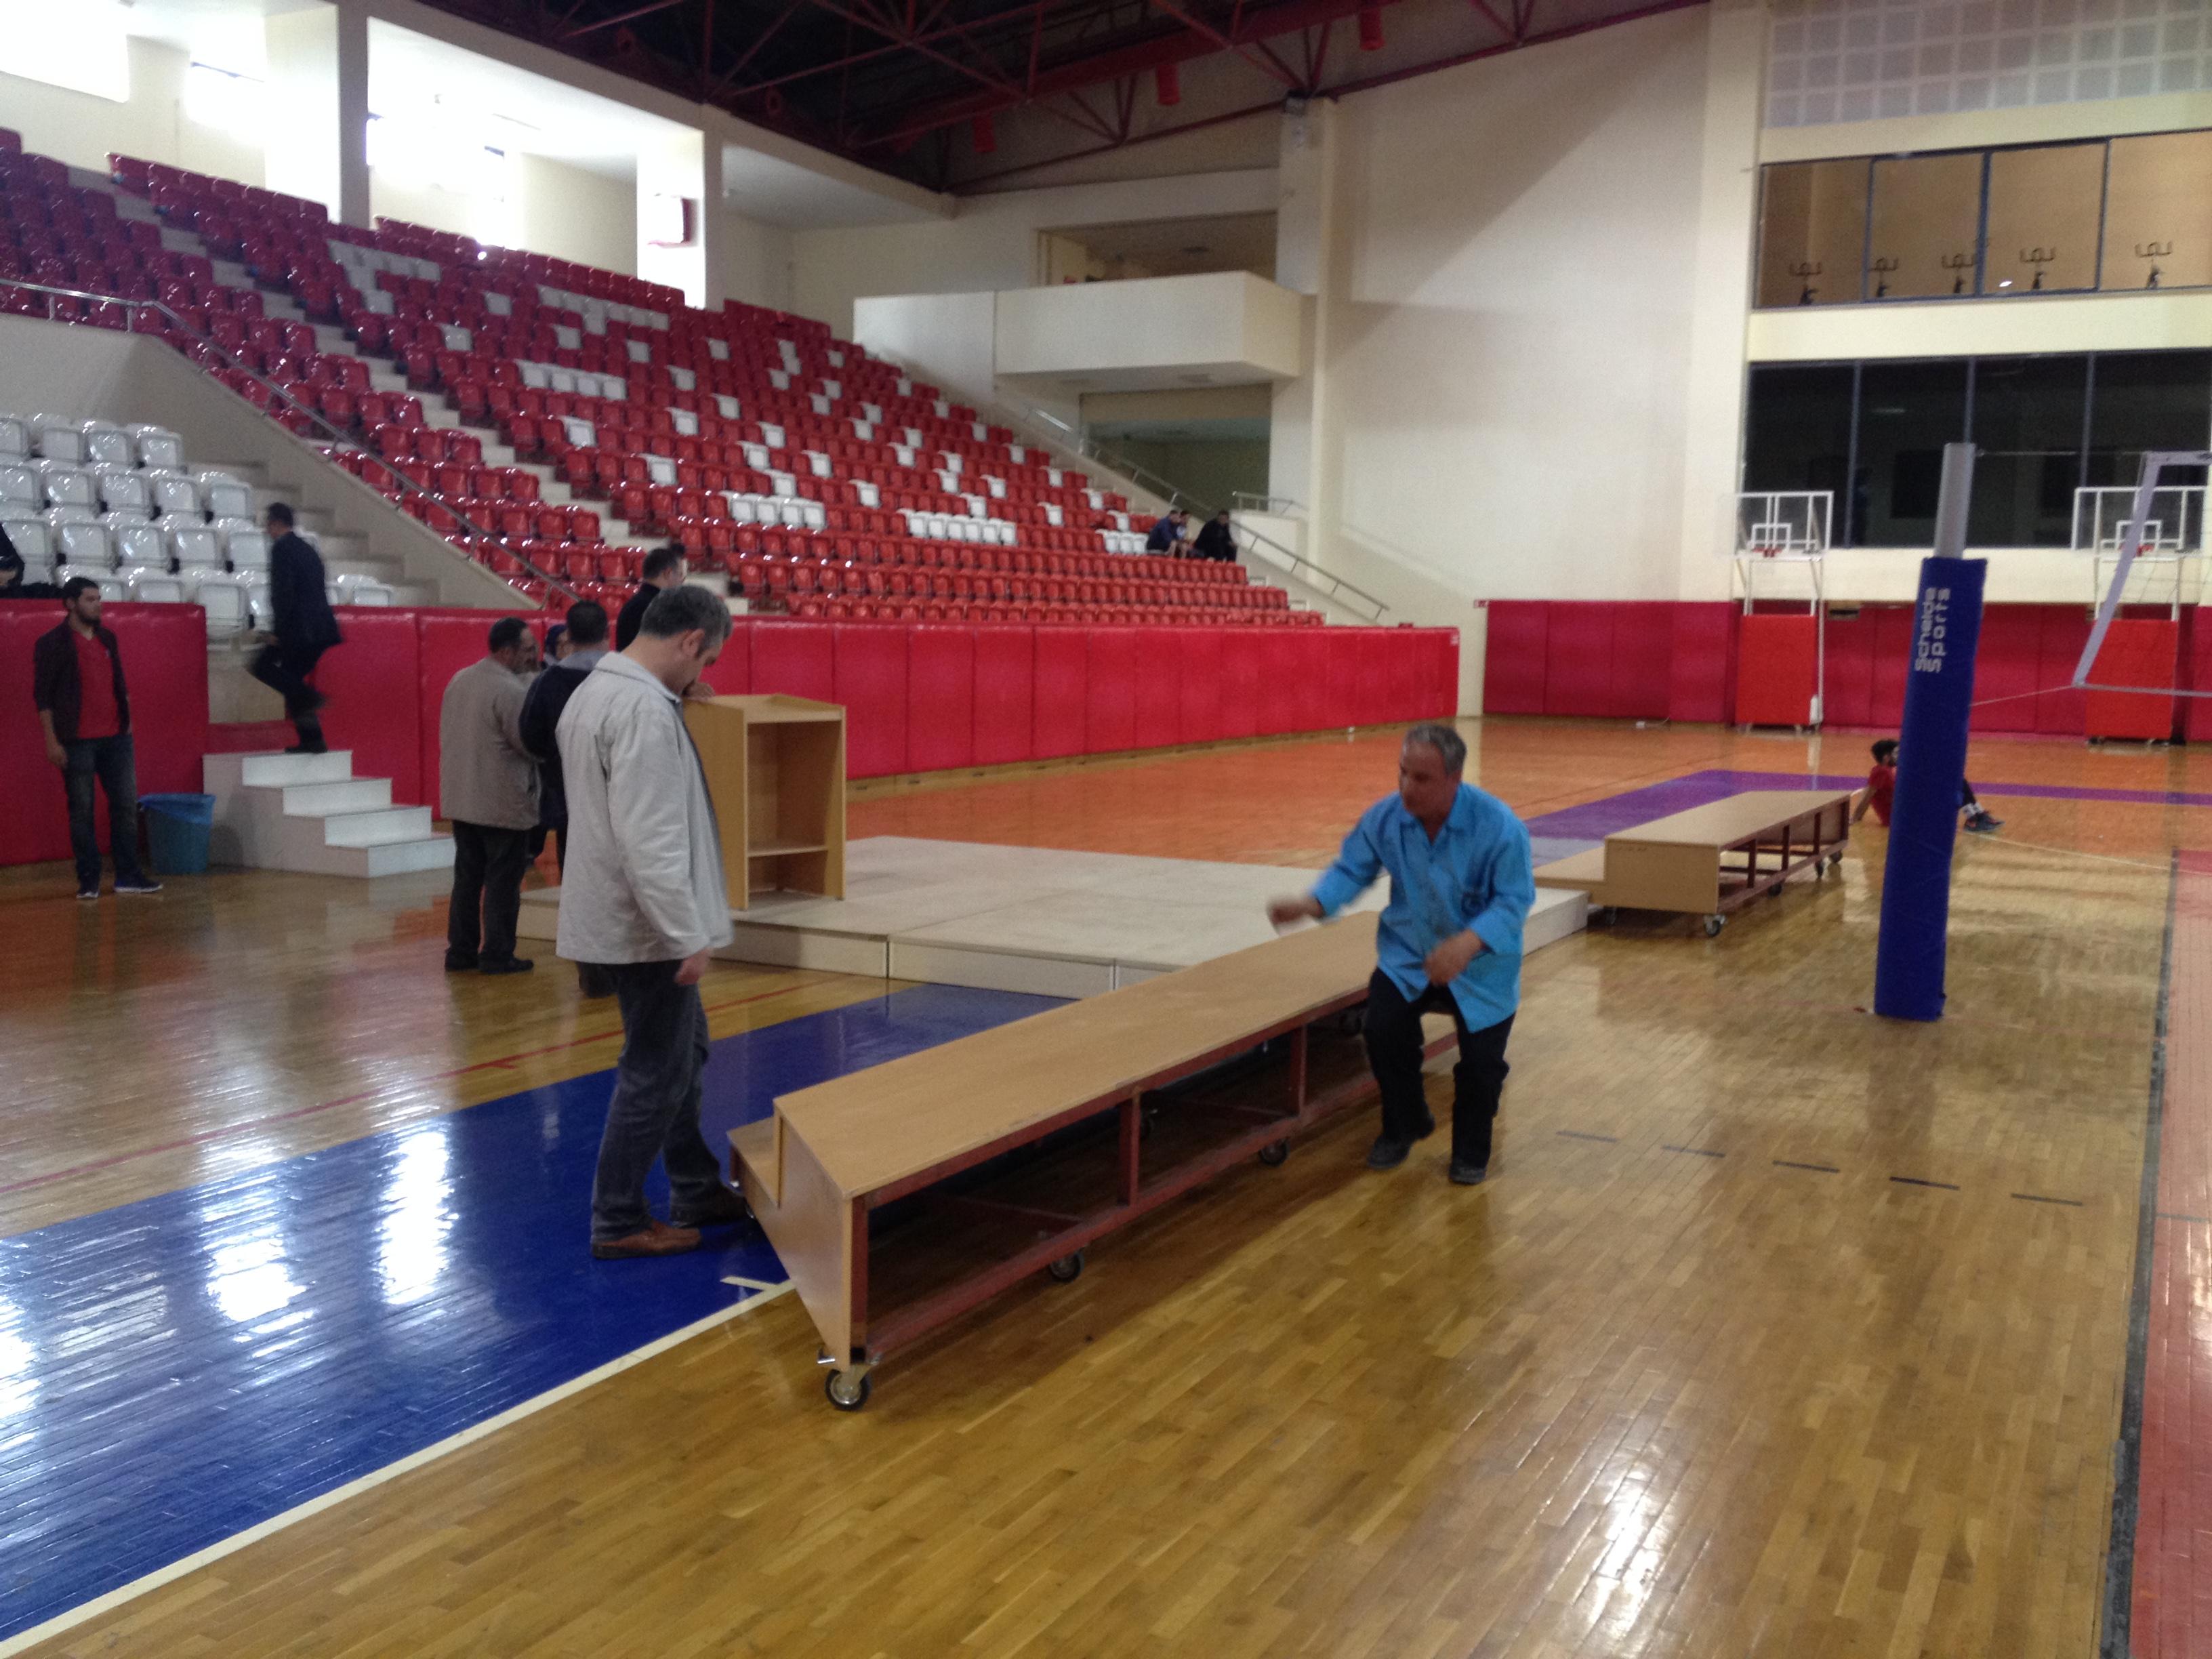 sdü spor salonu (14)